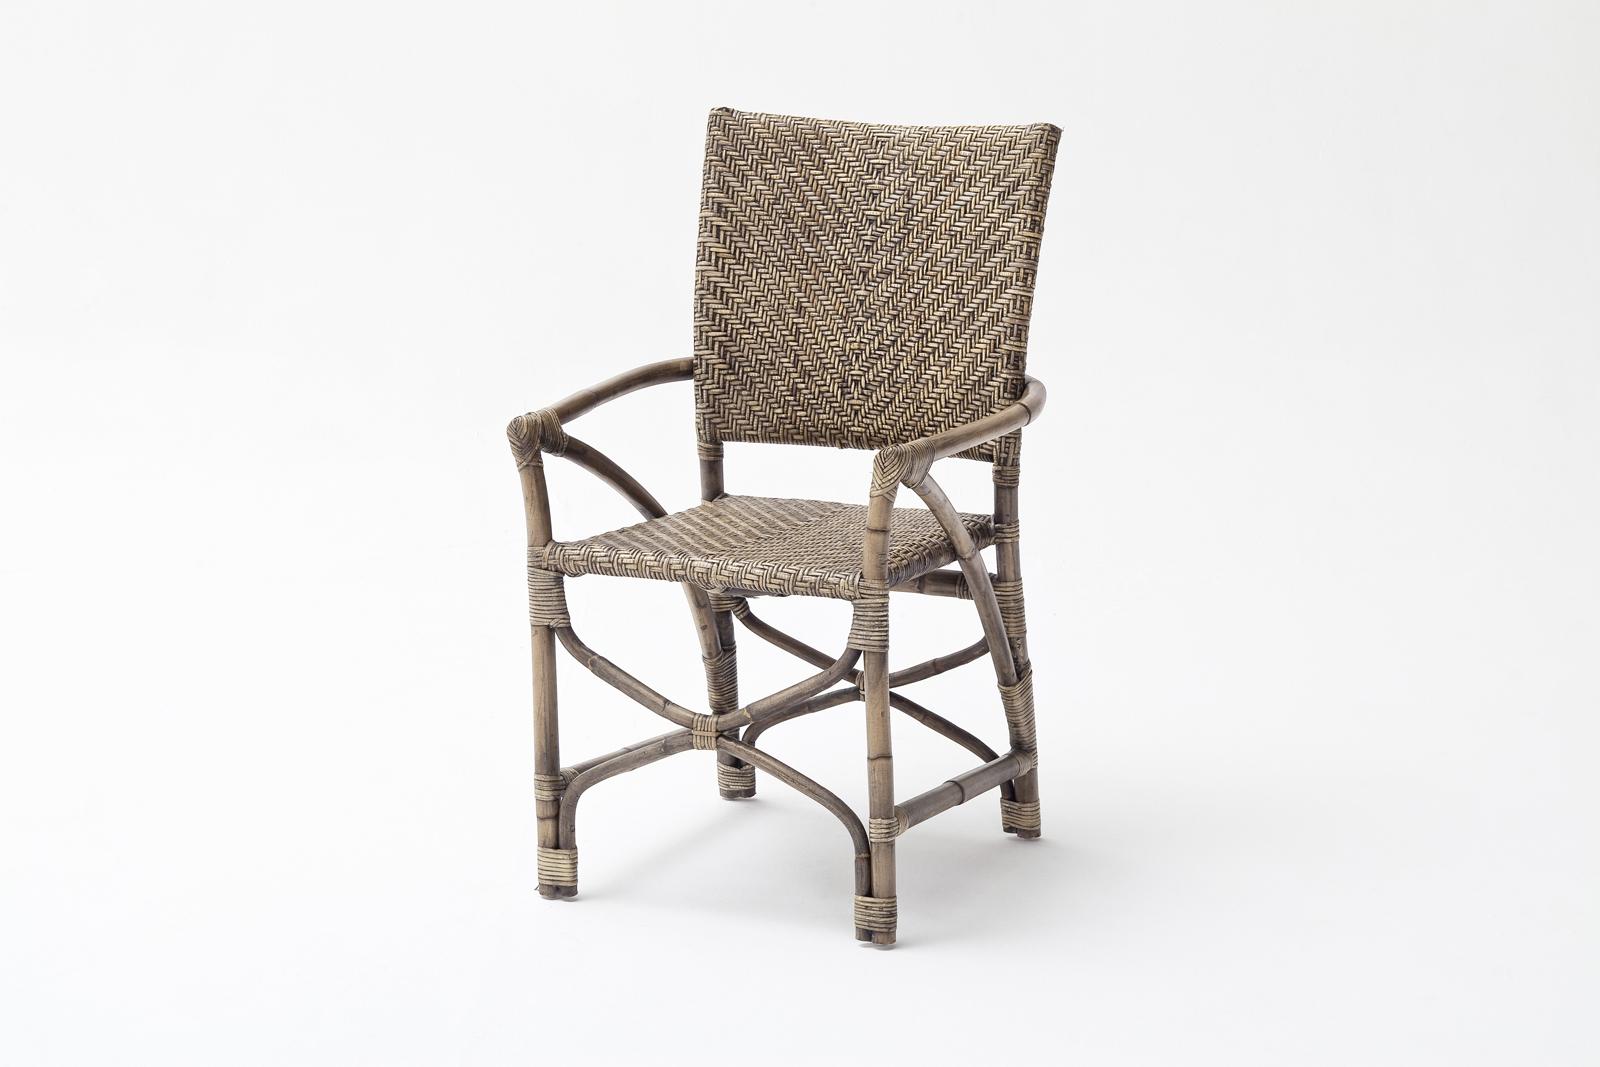 Assortiment 3 x droite fauteuil bras S/'adapte chaises Carré /& Rond Seatbox jambes.